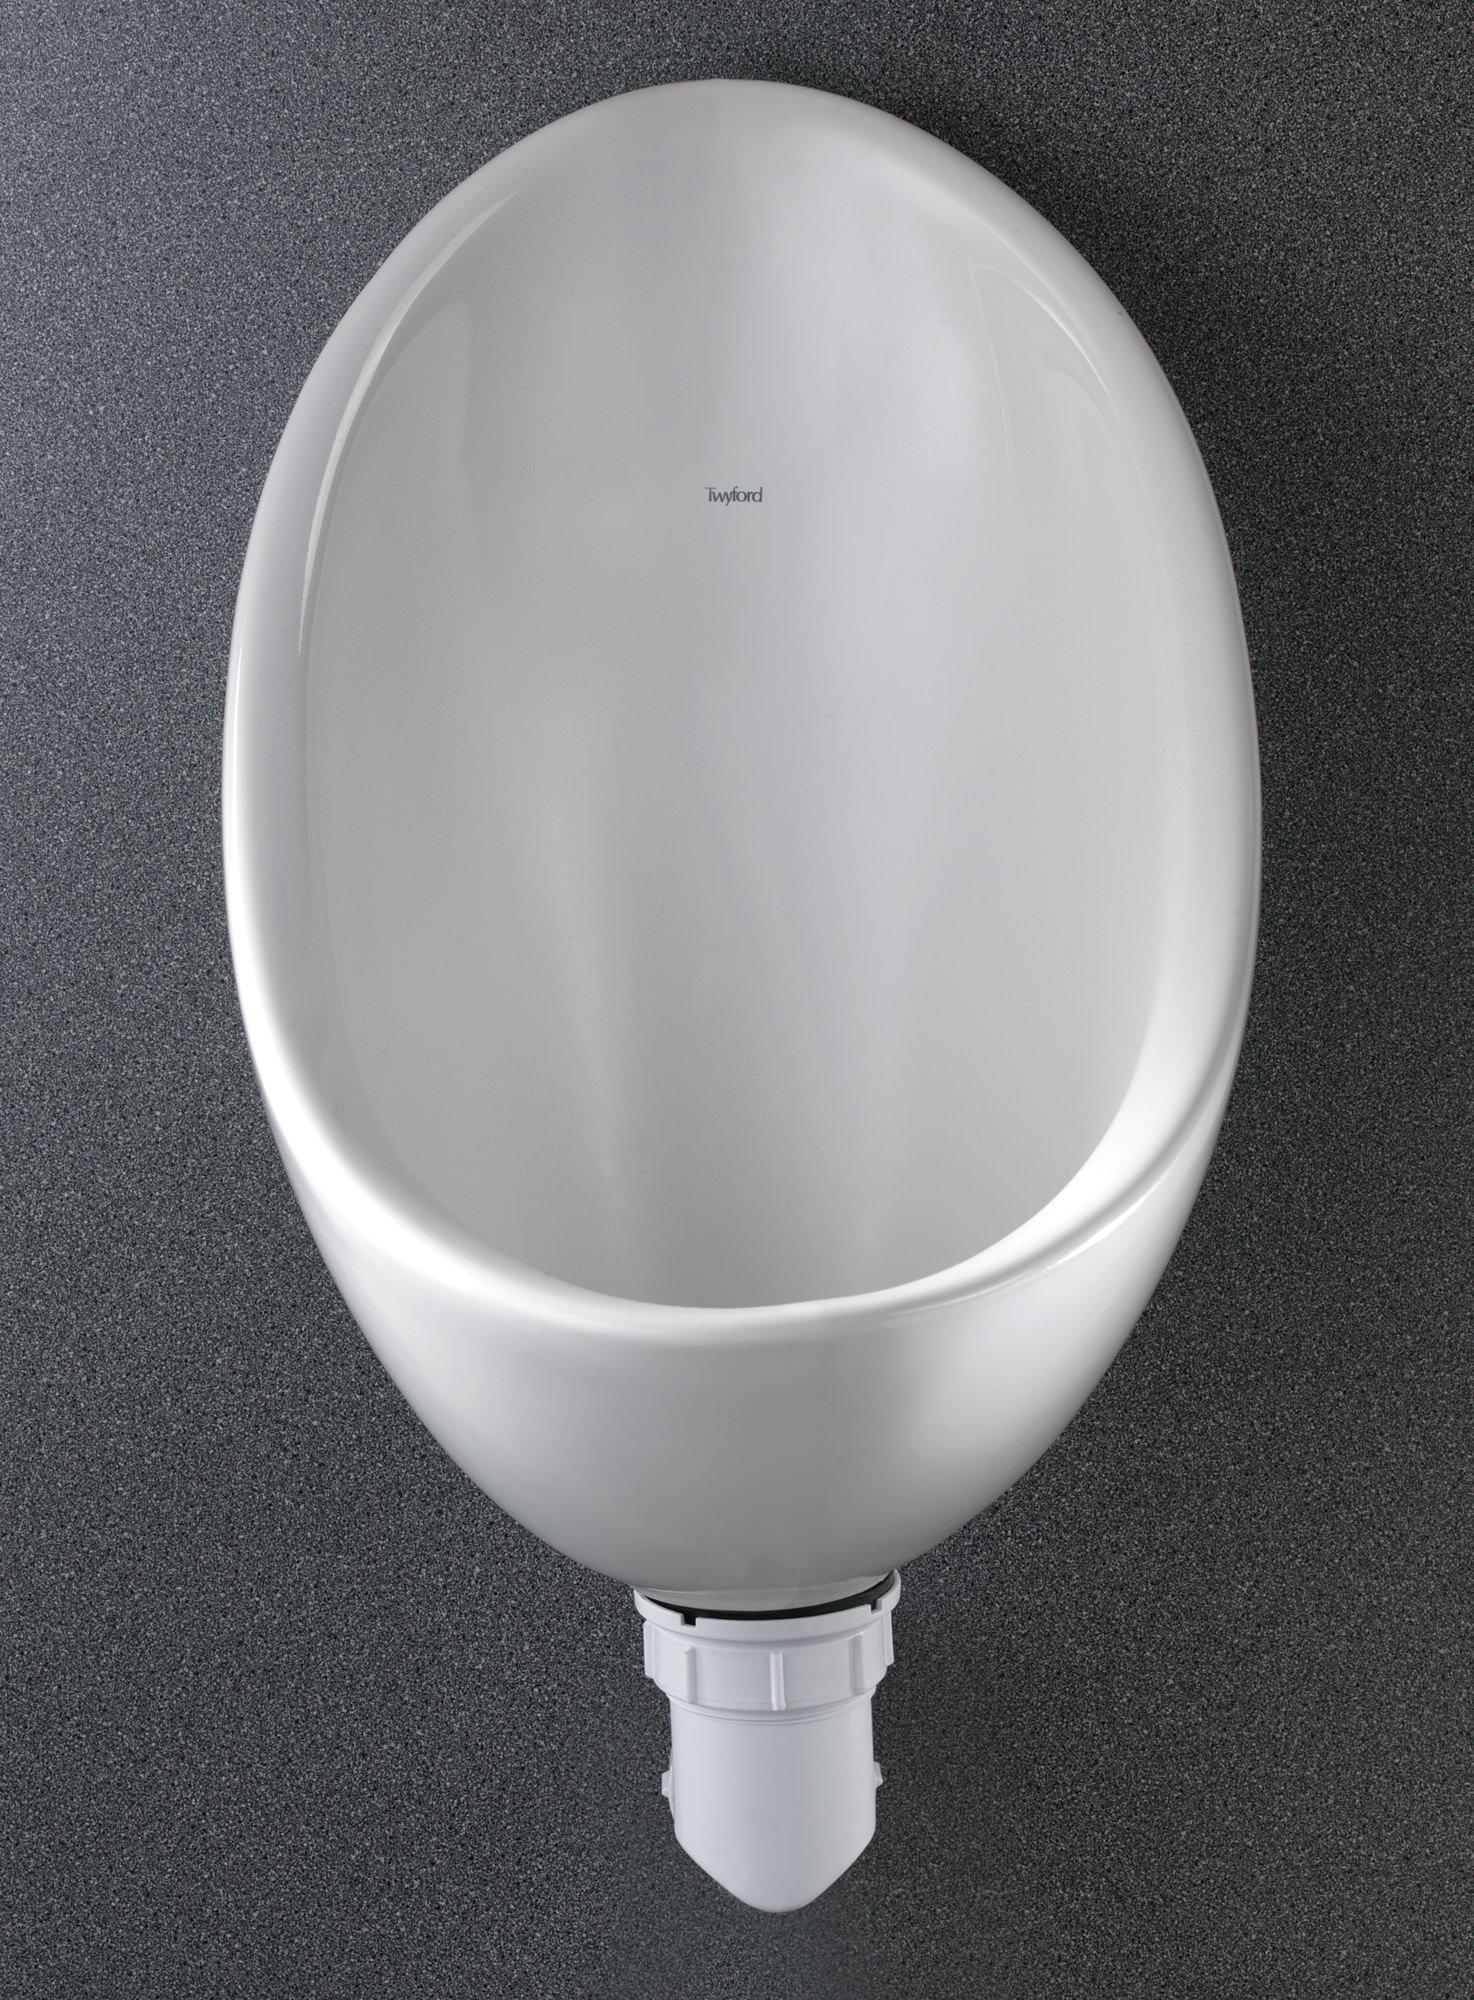 Twyford Clifton Waterless Urinal Bowl 305 X 375 X 445mm